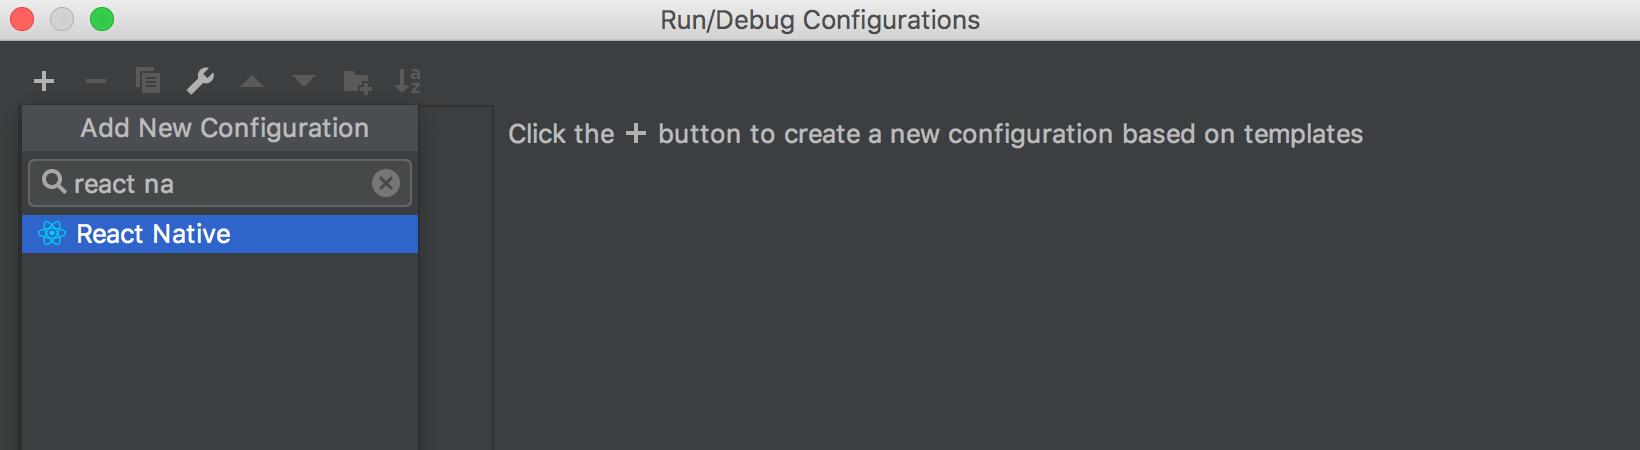 add-a-configuration